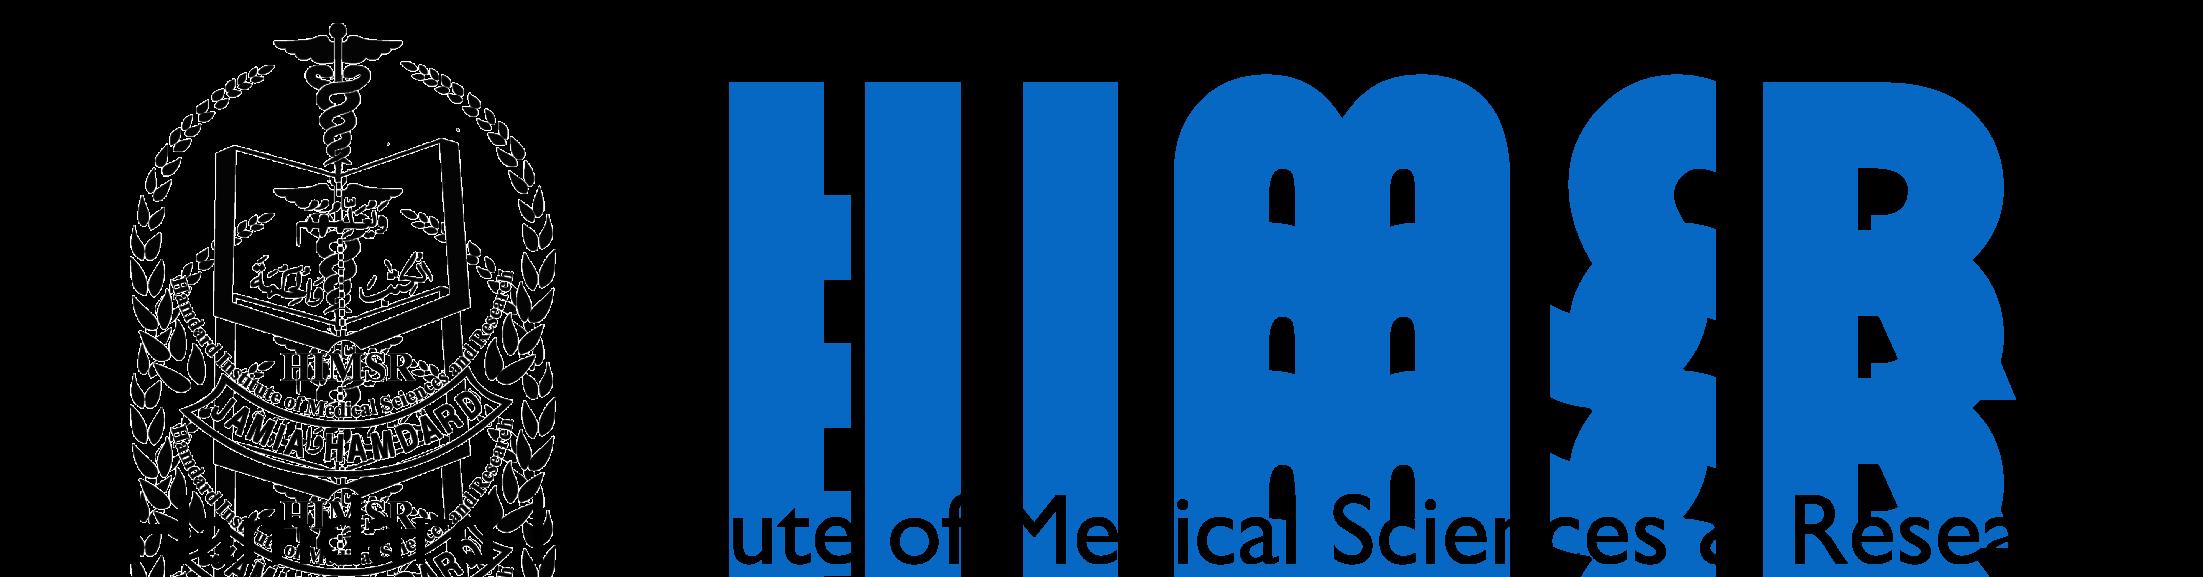 Hamdard Institute of Medical Sciences & Research (HIMSR) July 2017 Job  for Professor, Assistant Professor